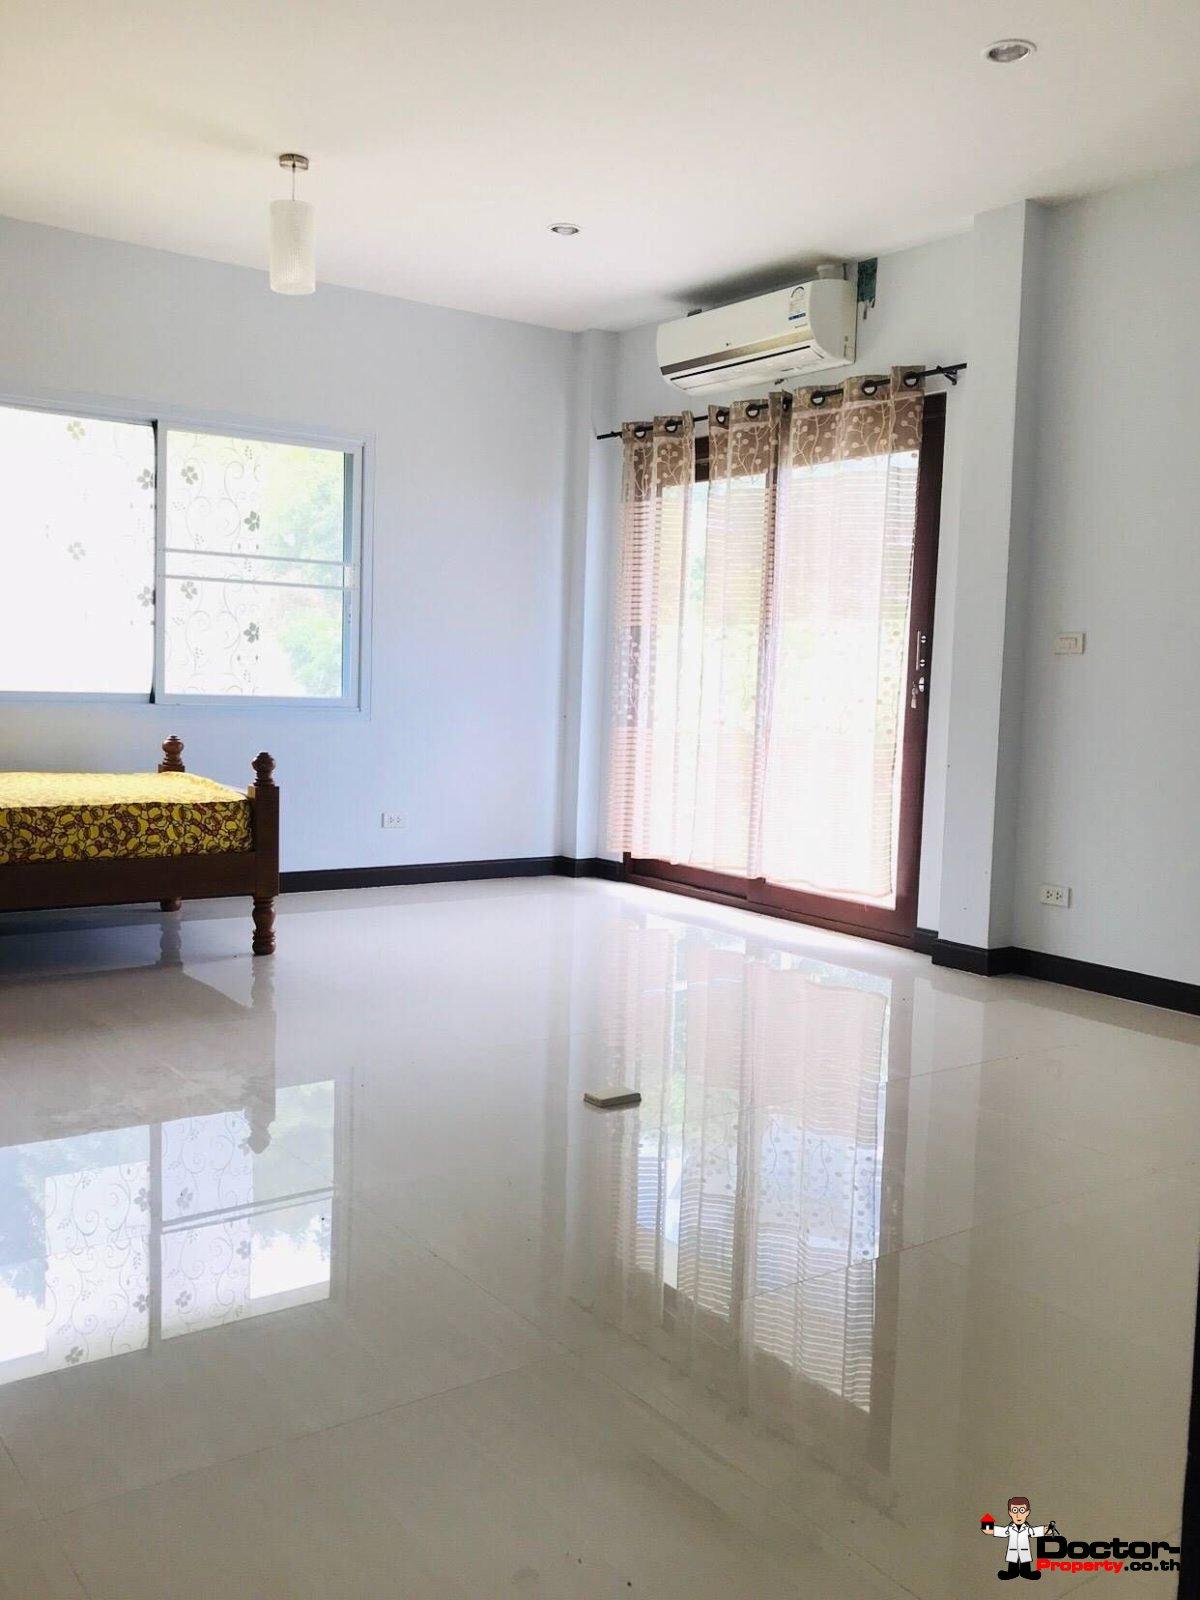 6 Bedroom Sea View Villa in Plai Laem, Koh Samui - For Sale